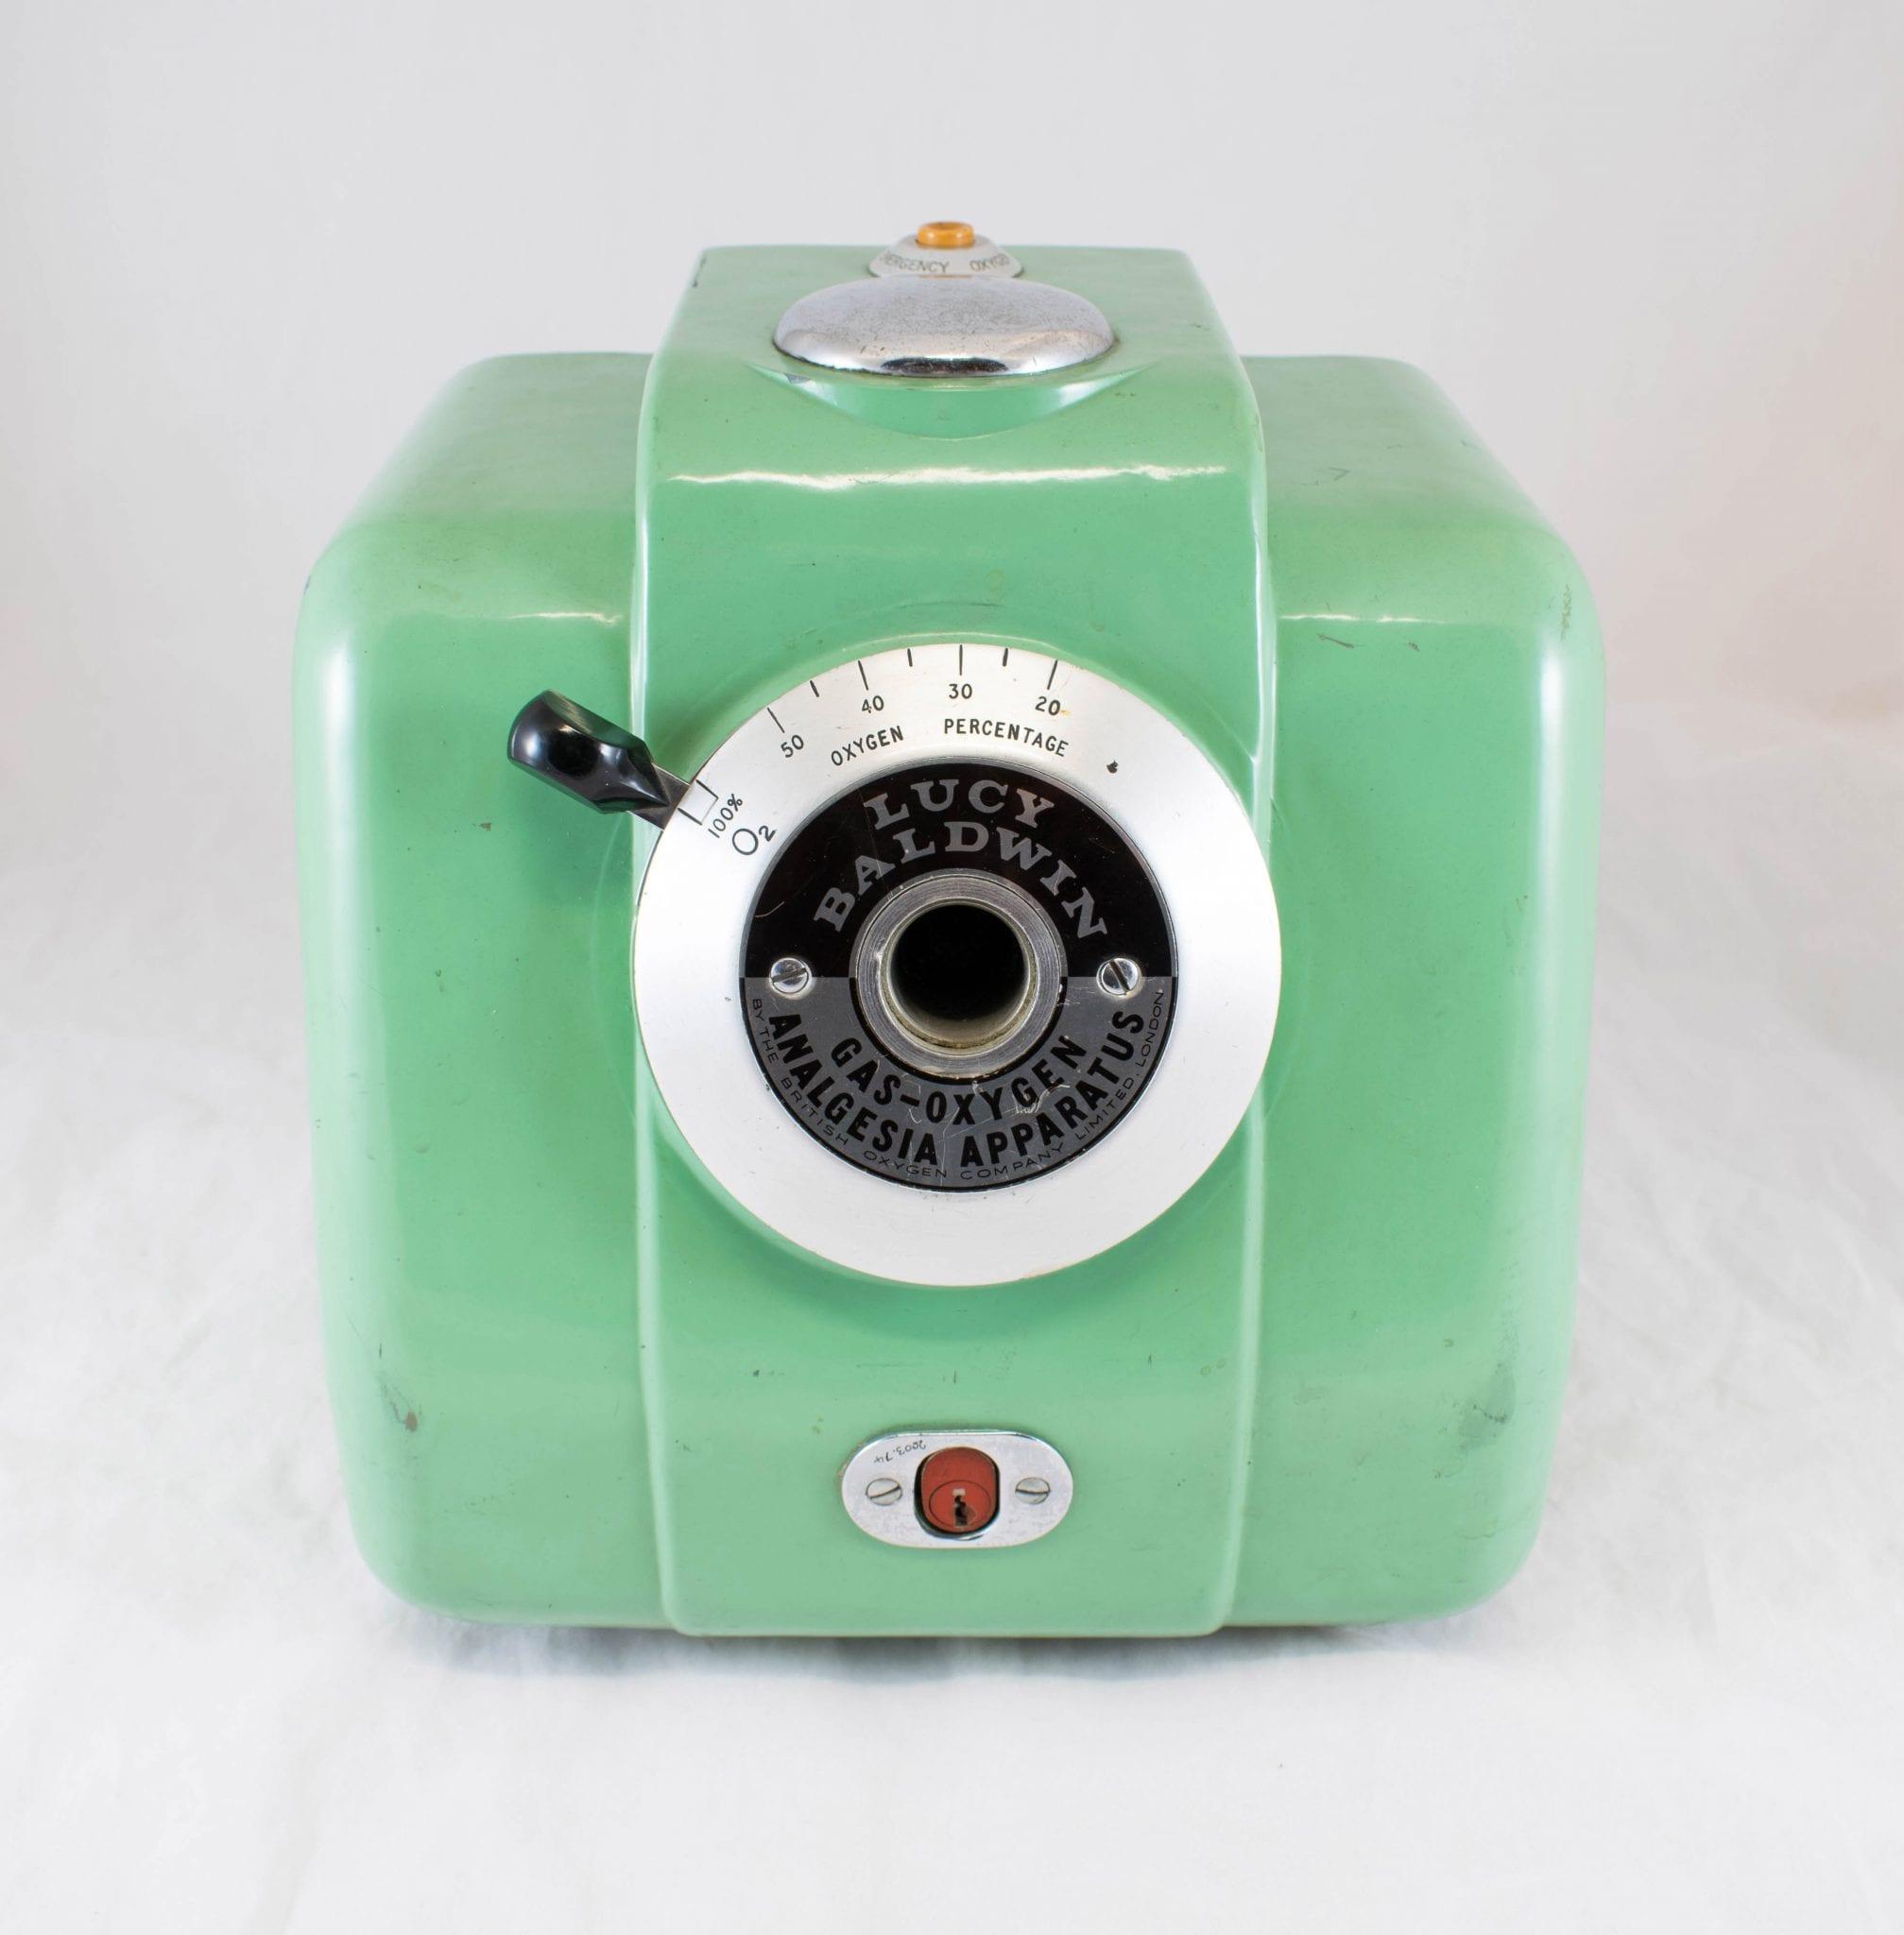 2003.74_Lucy Baldwin apparatus 4